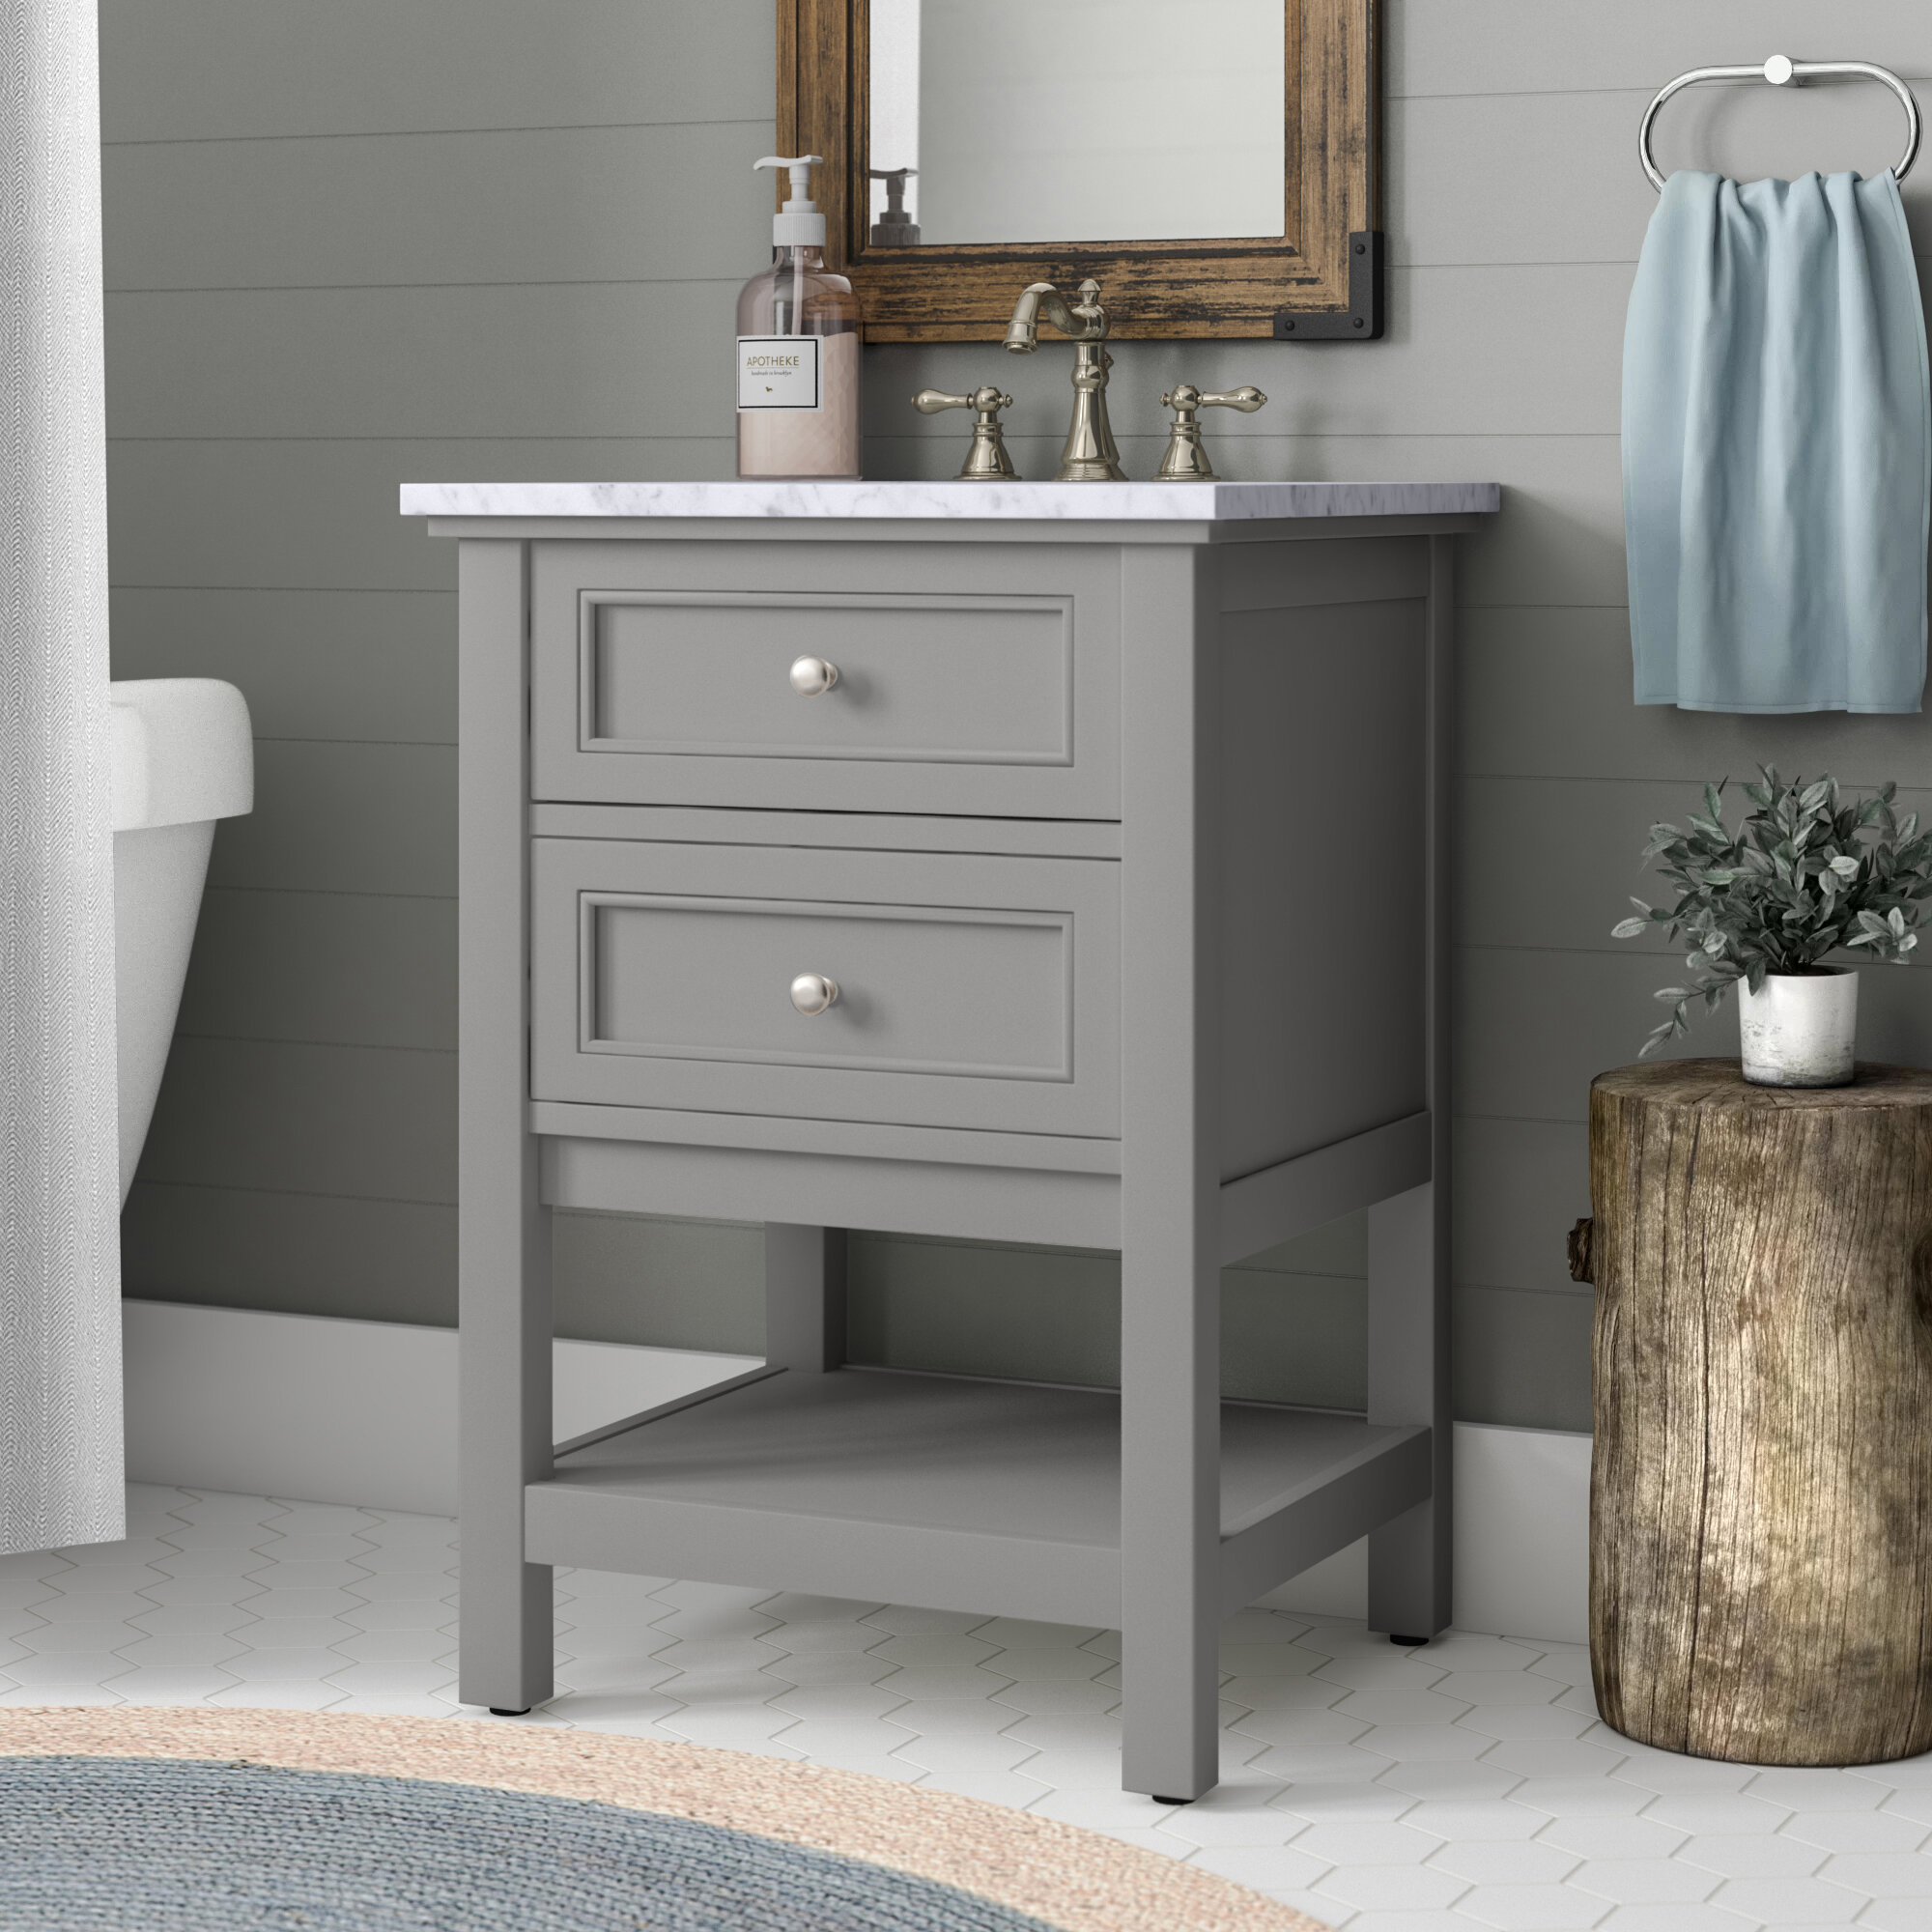 Cody 24 Single Bathroom Vanity Set Reviews Birch Lane